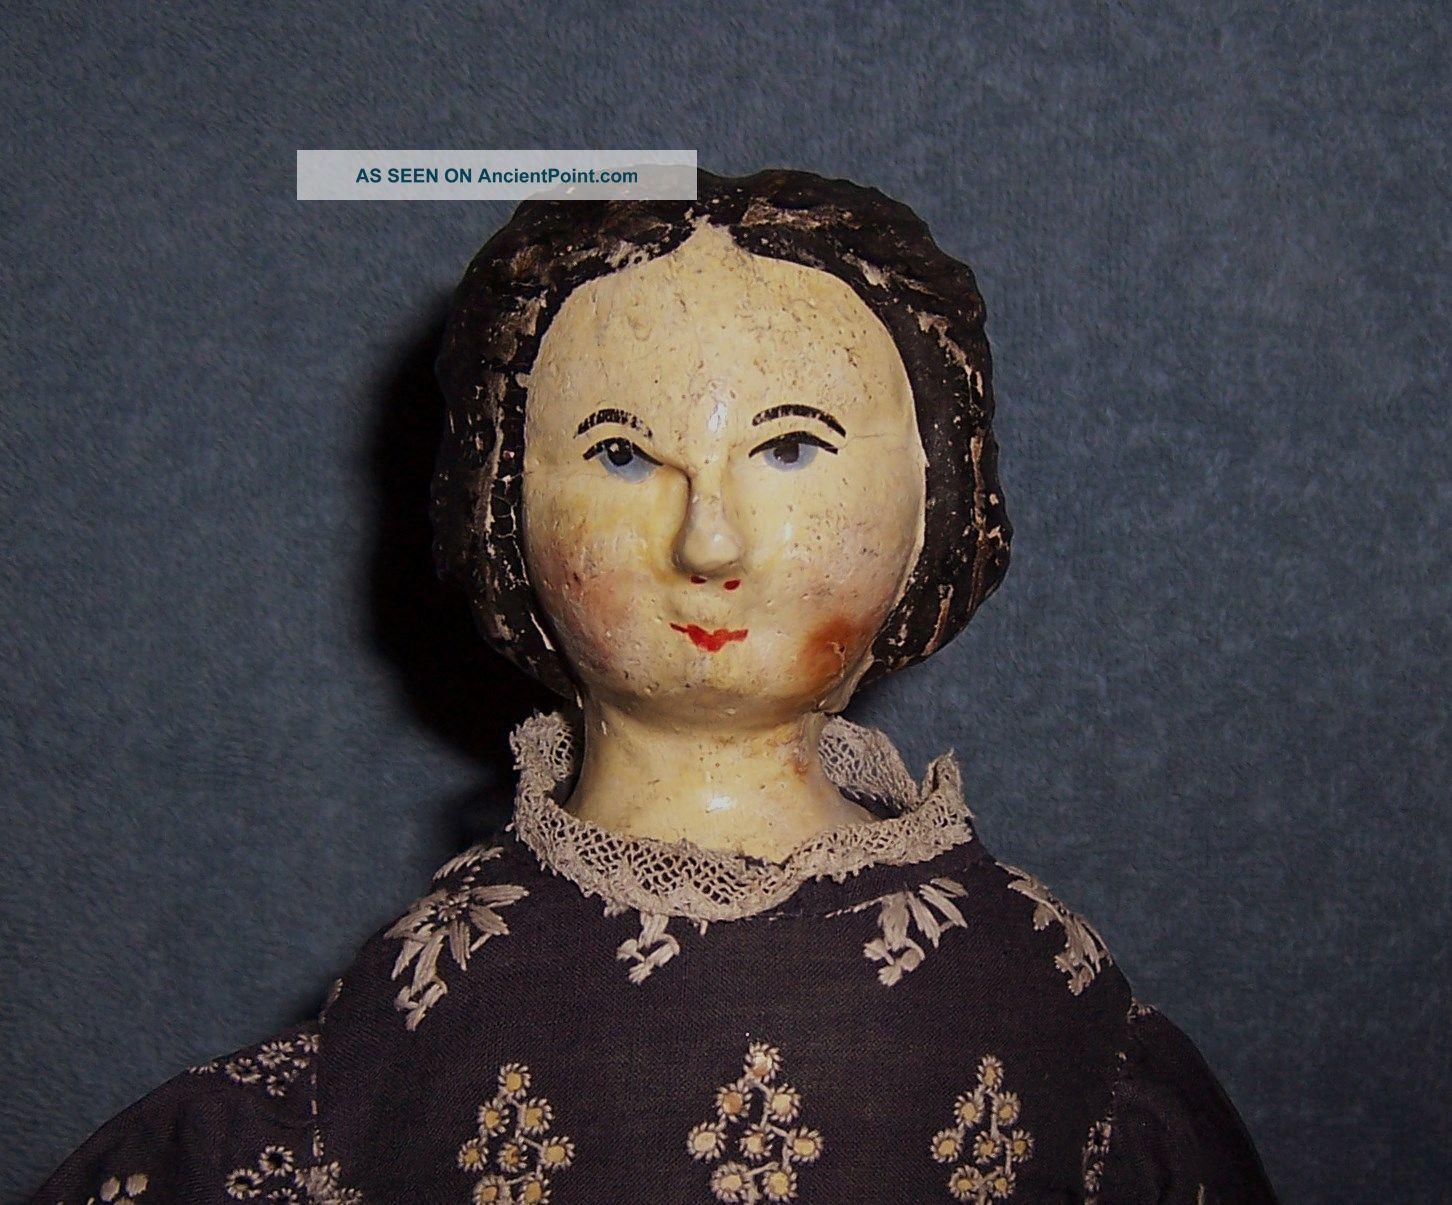 Antique Primitive Wood Cloth Doll Wooden Head - Shoulder Plate,  Bottom,  Legs,  Arms Primitives photo